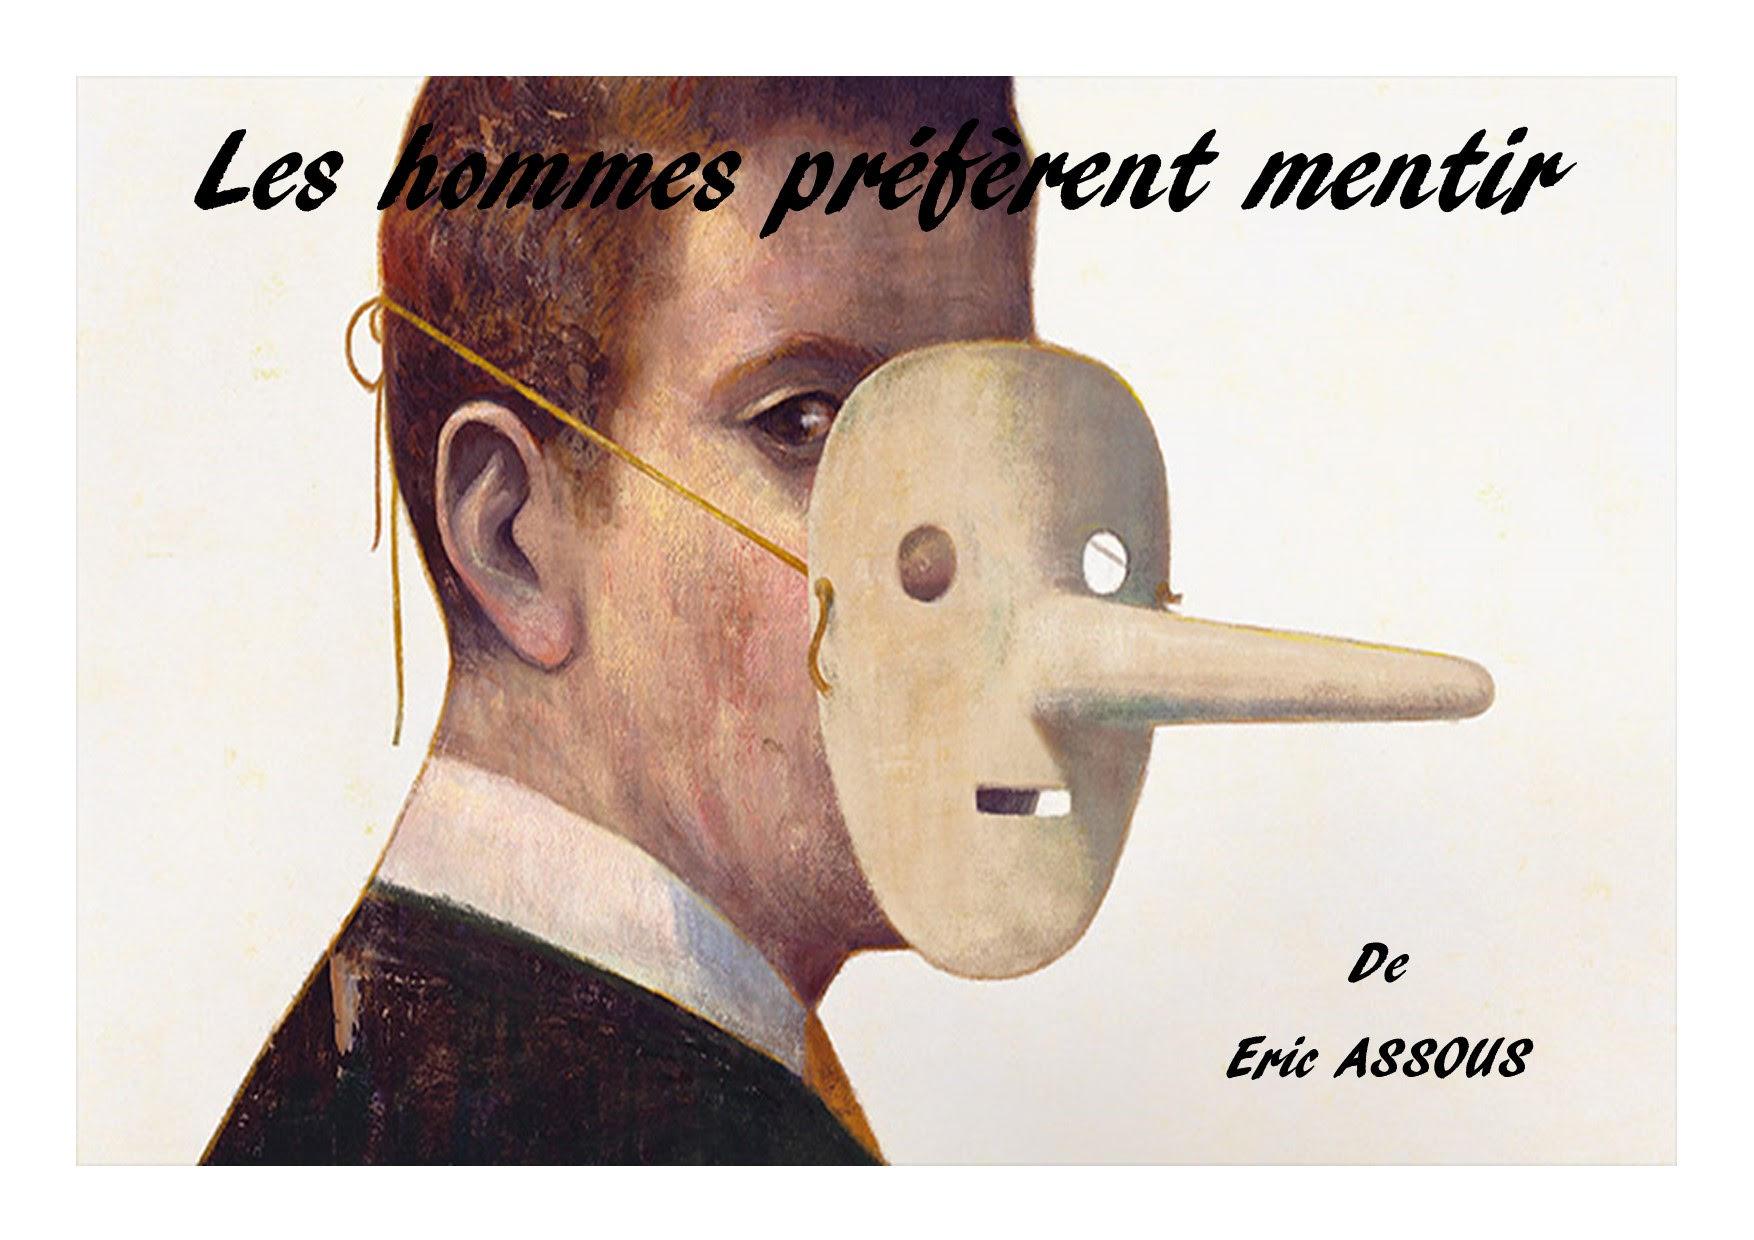 LES HOMMES PREFERENT MENTIR